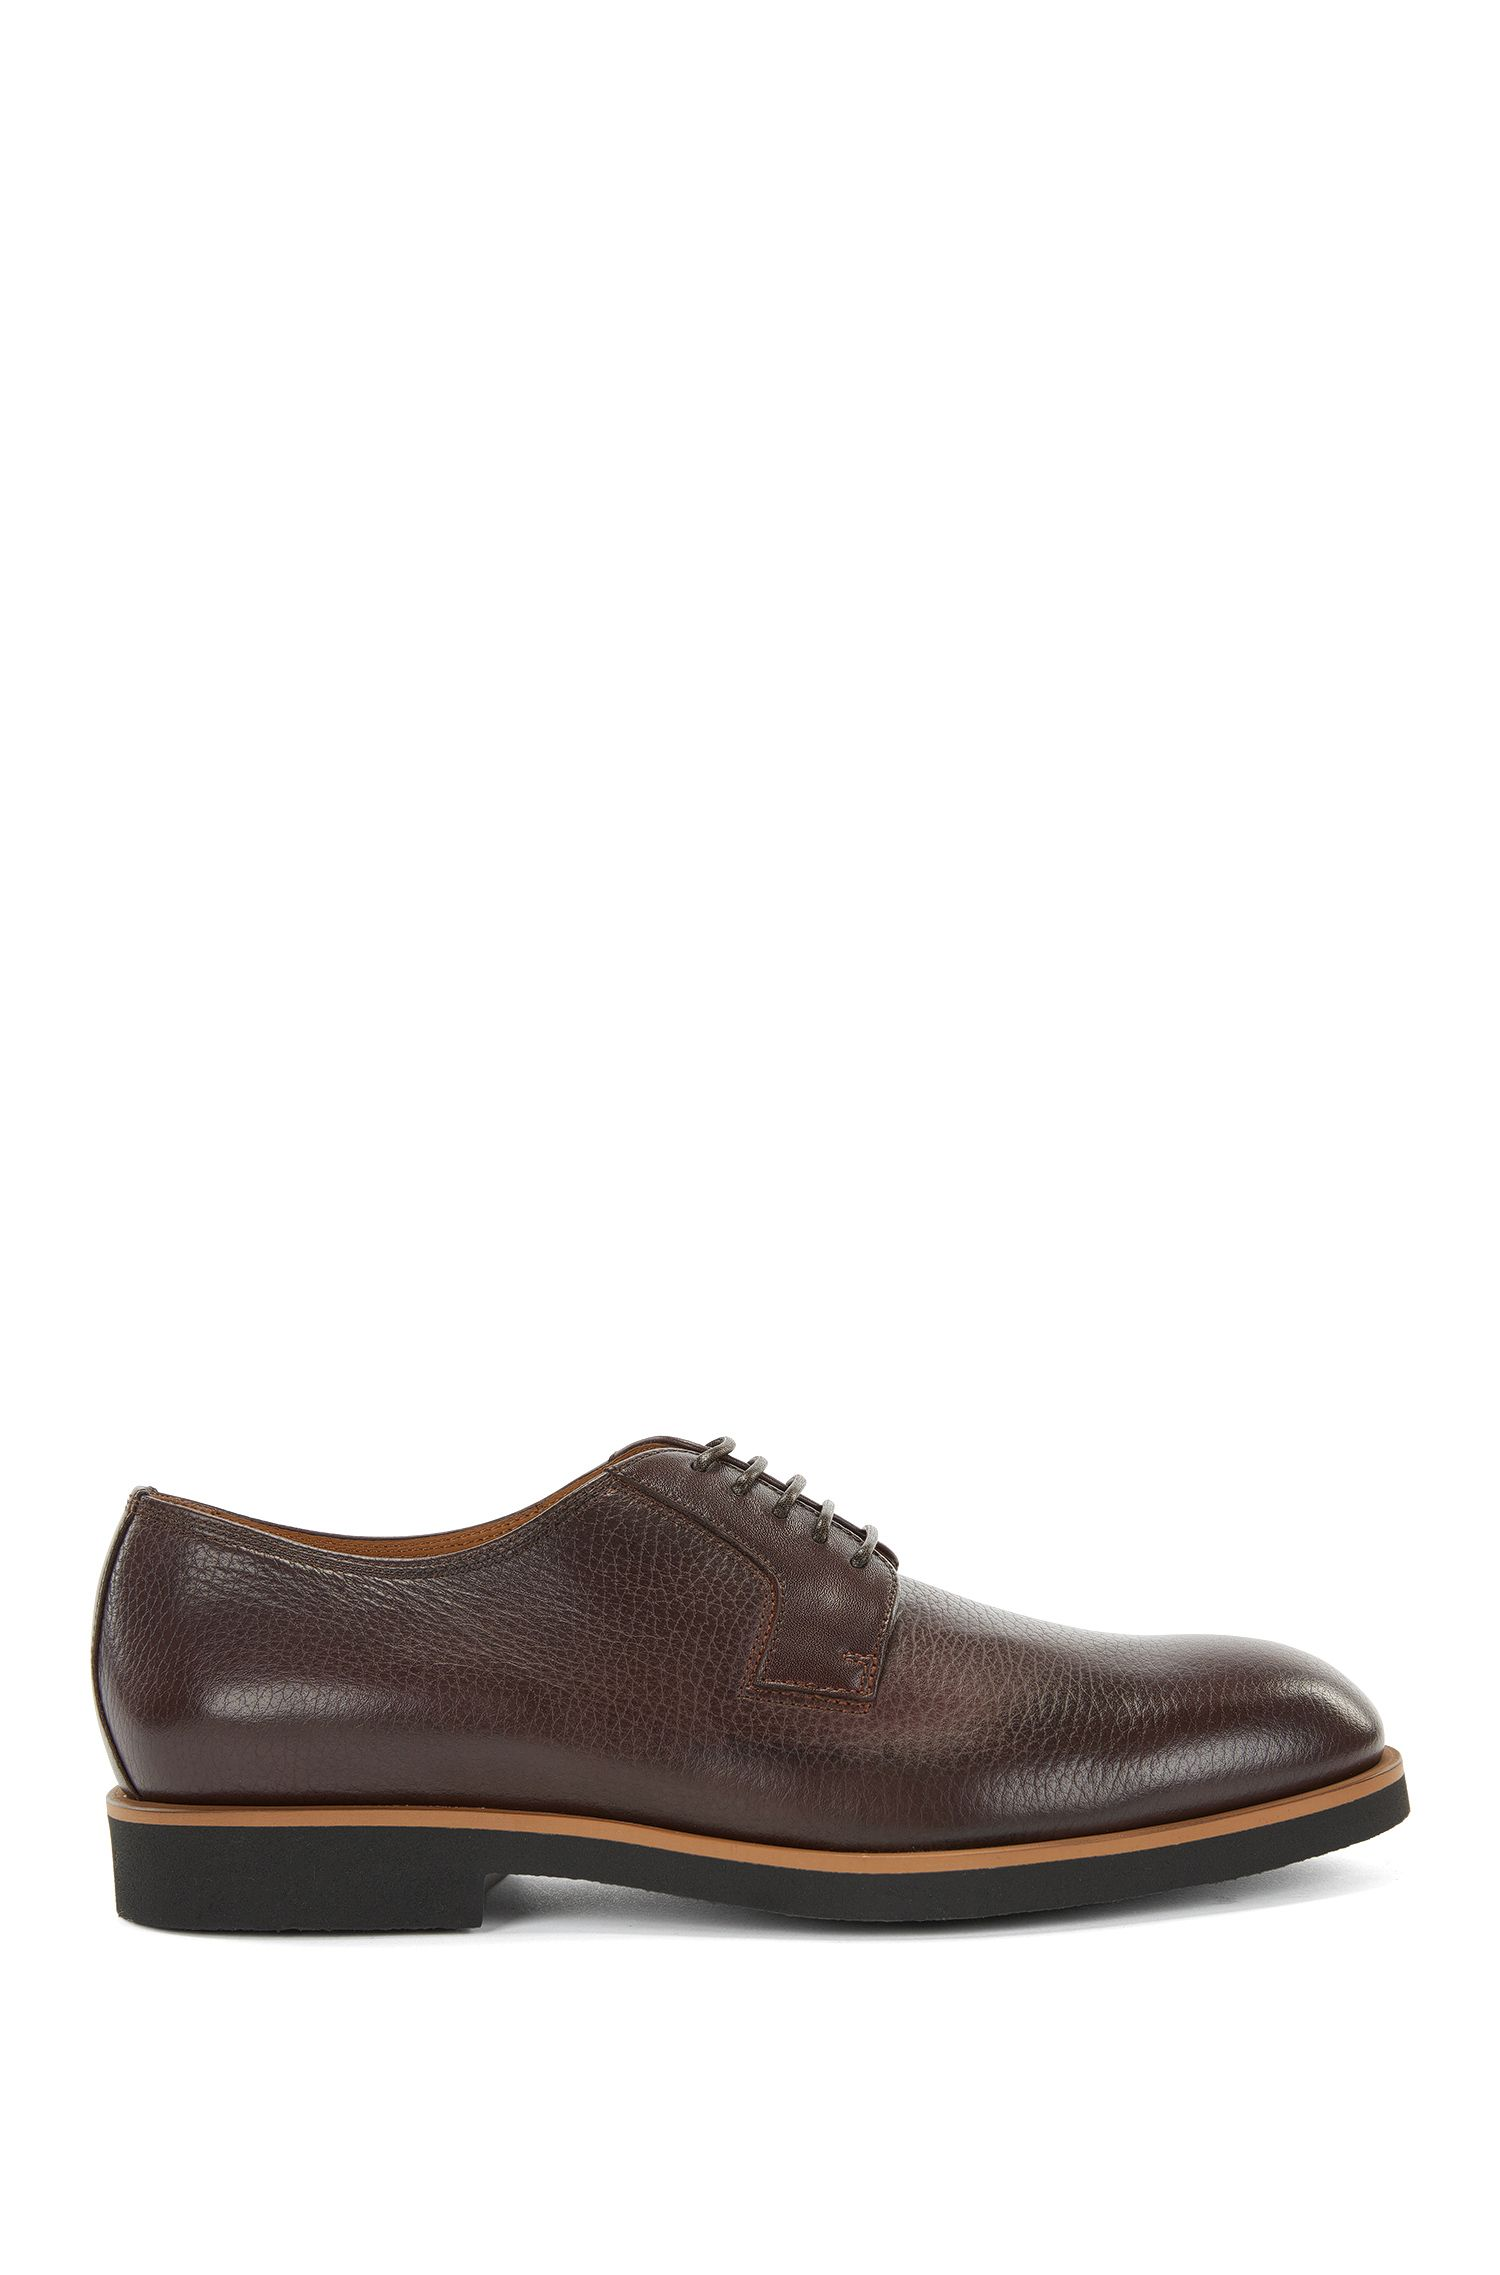 Grained Leather Derby Shoe | Eden